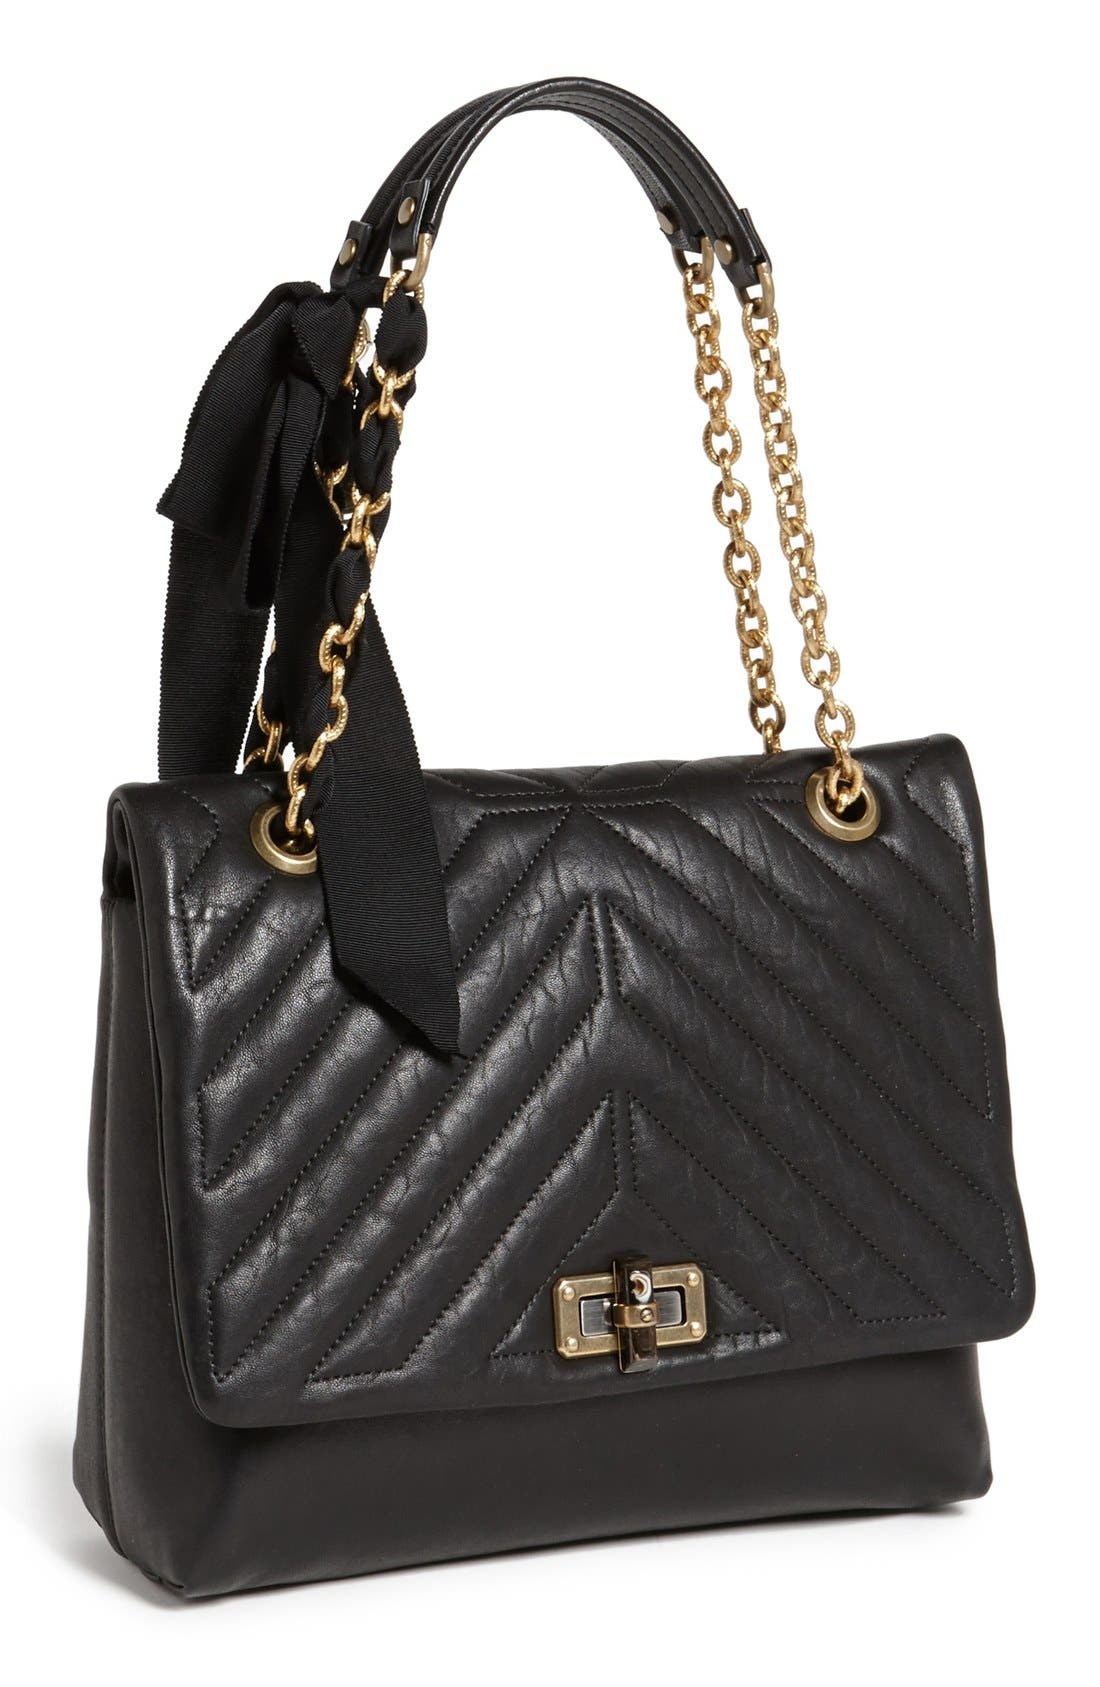 Main Image - Lanvin 'Happy' Quilted Flap Shoulder Bag